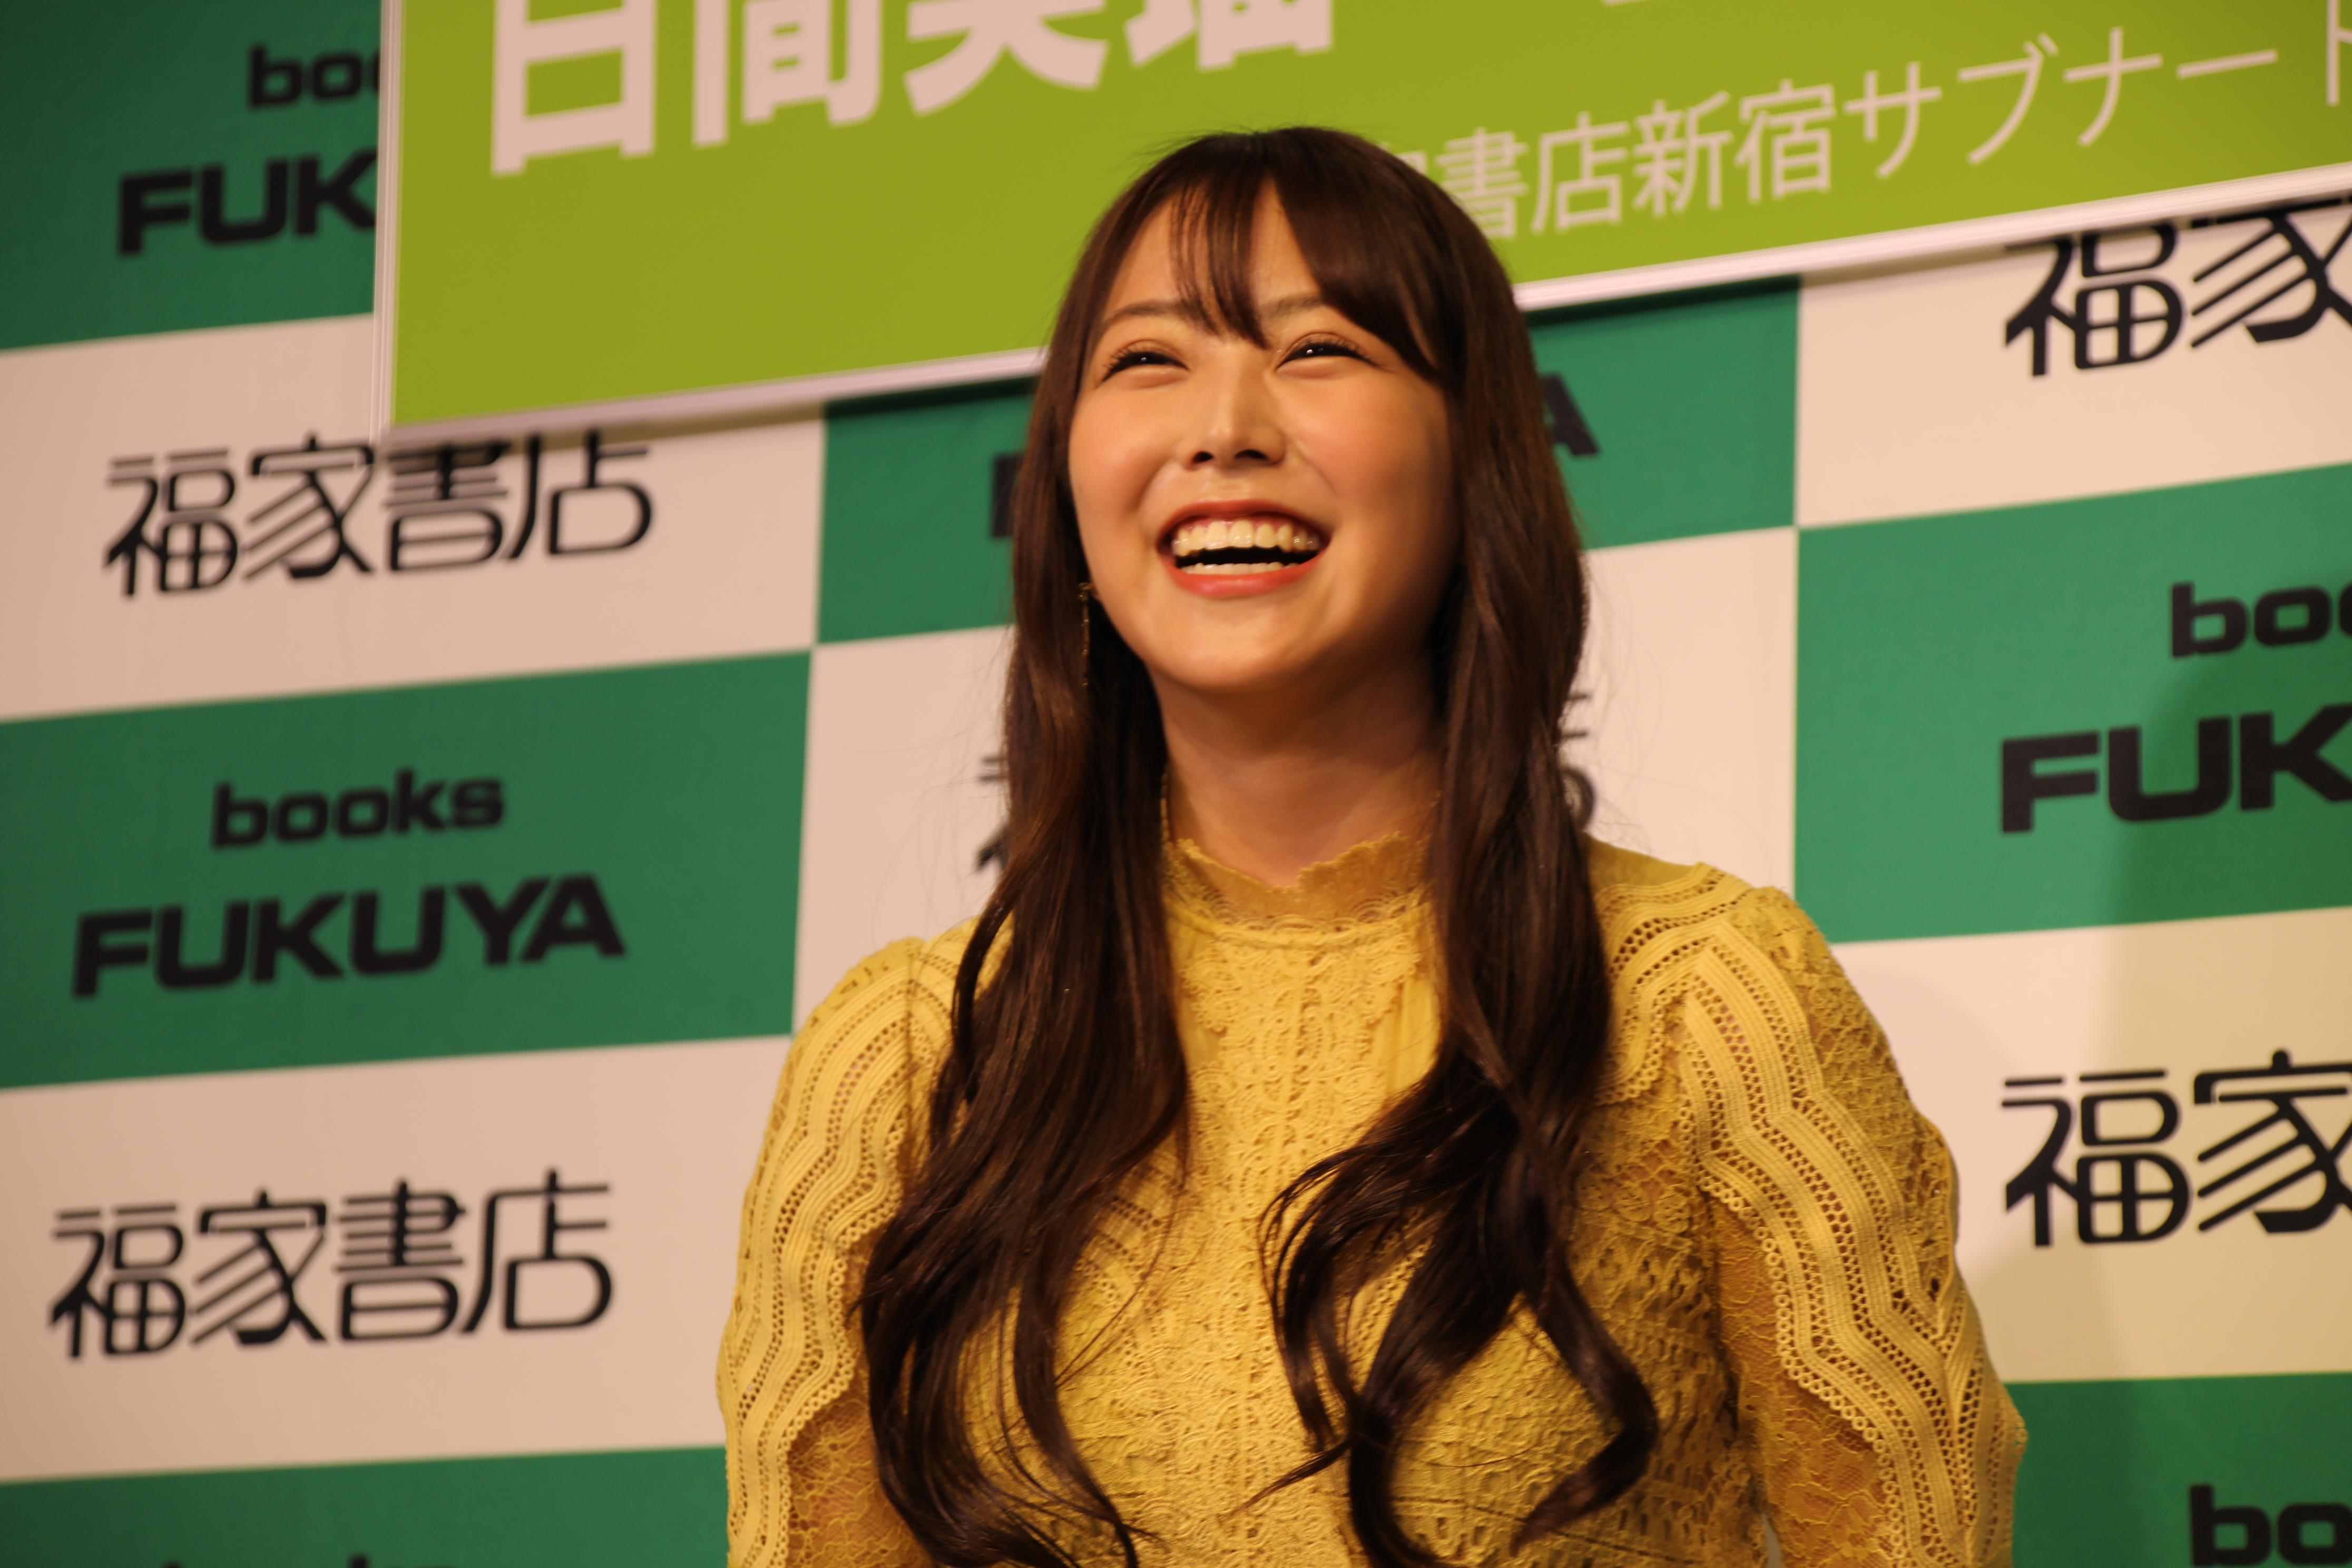 NMB48白間美瑠「次は水着でボルダリングに挑戦したいです!ヤバいですよね、やってみたいです!(笑)」